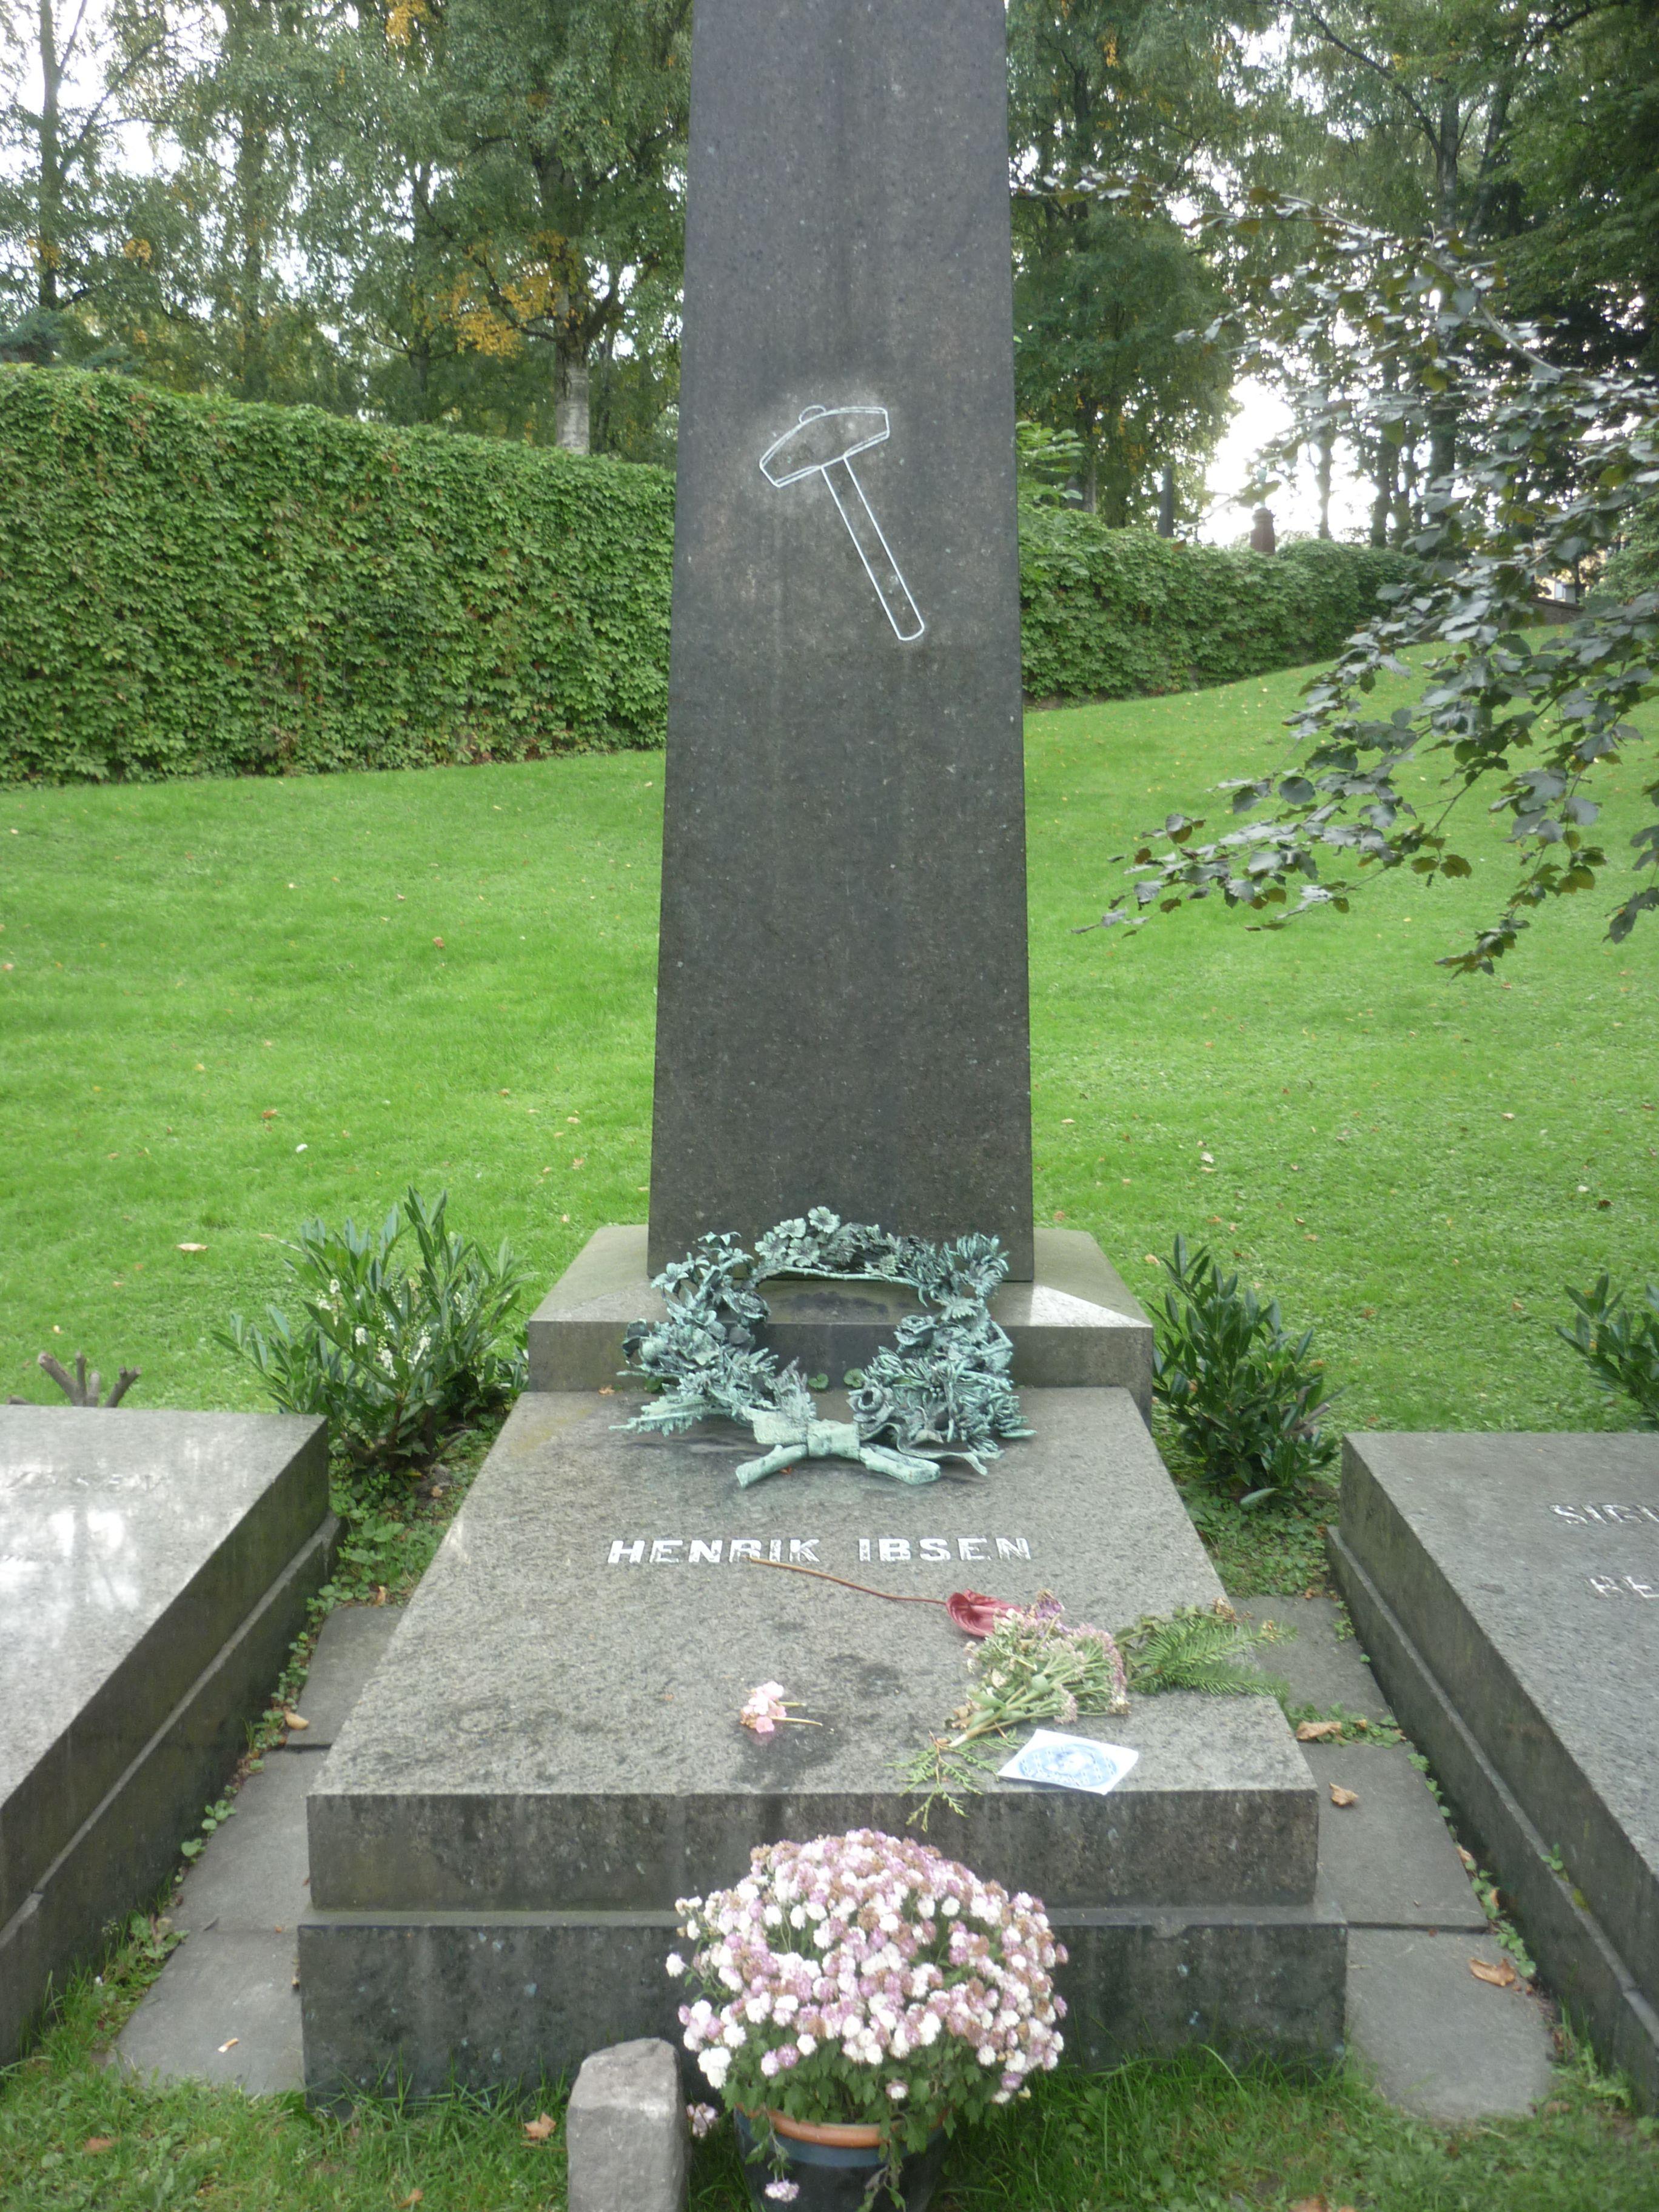 Henrik Ibsen 1828 1906 Location Cemetery Of Our Saviour Oslo